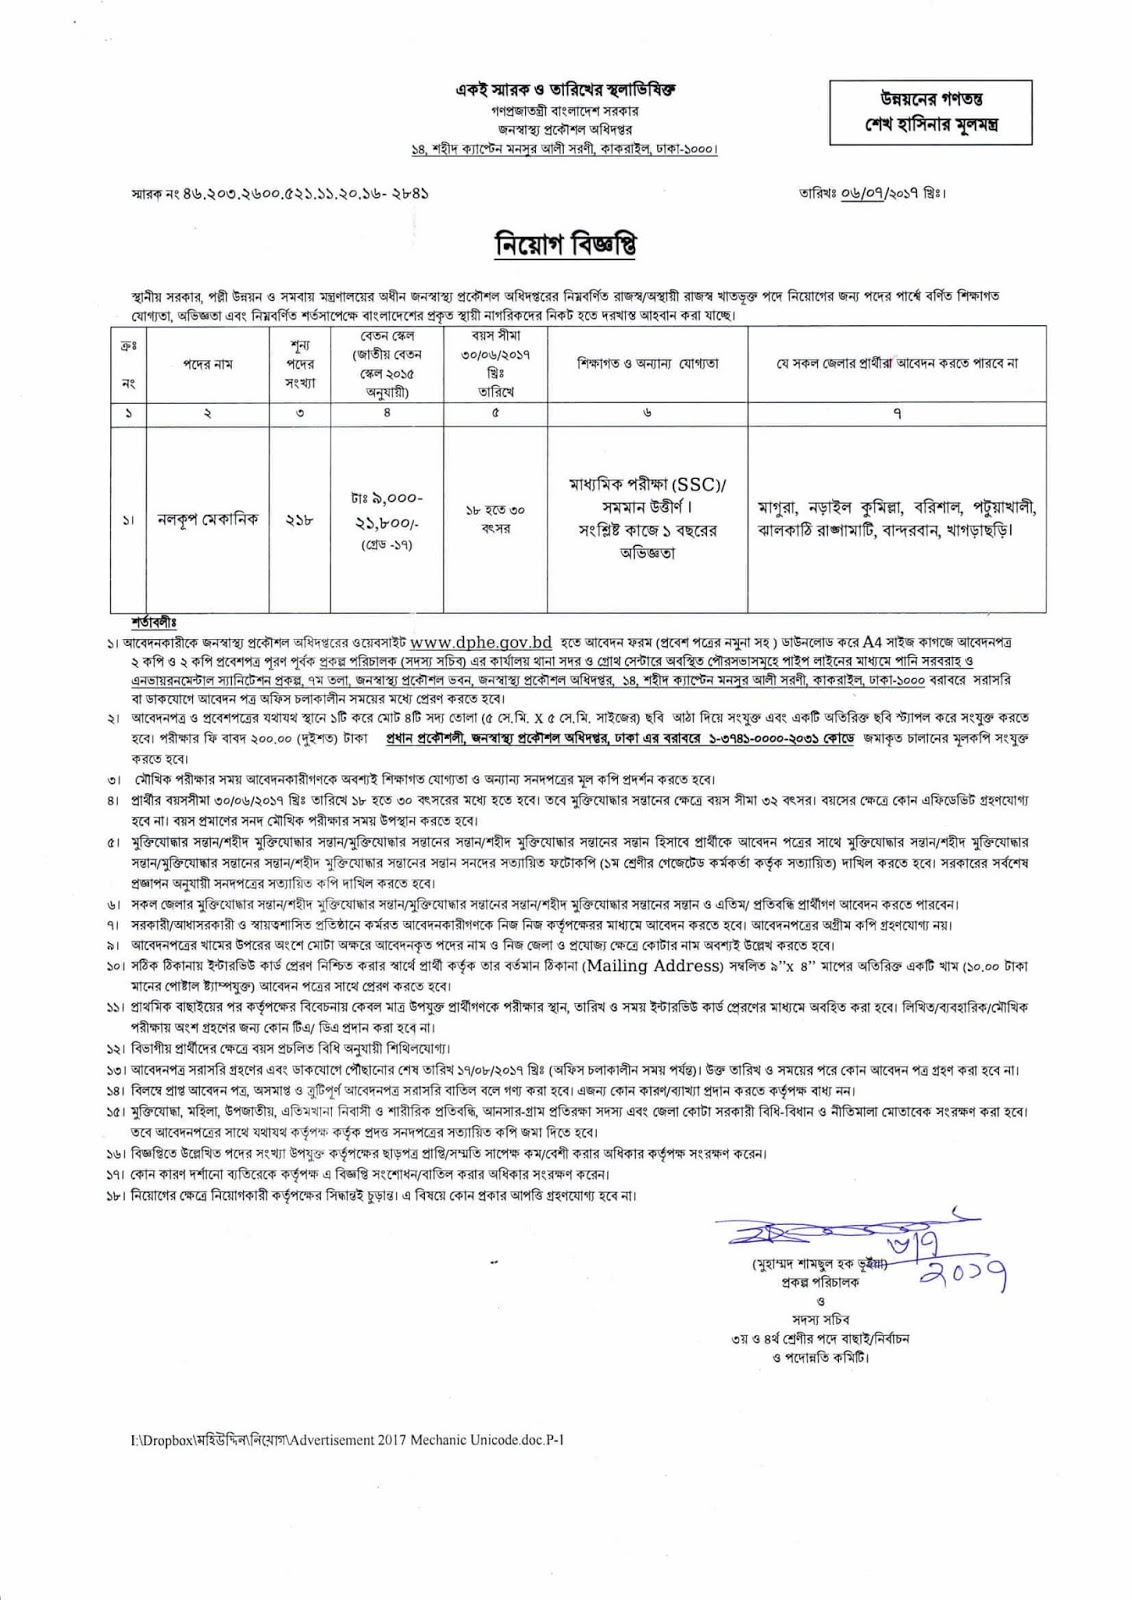 DPHE Job Circular 2017